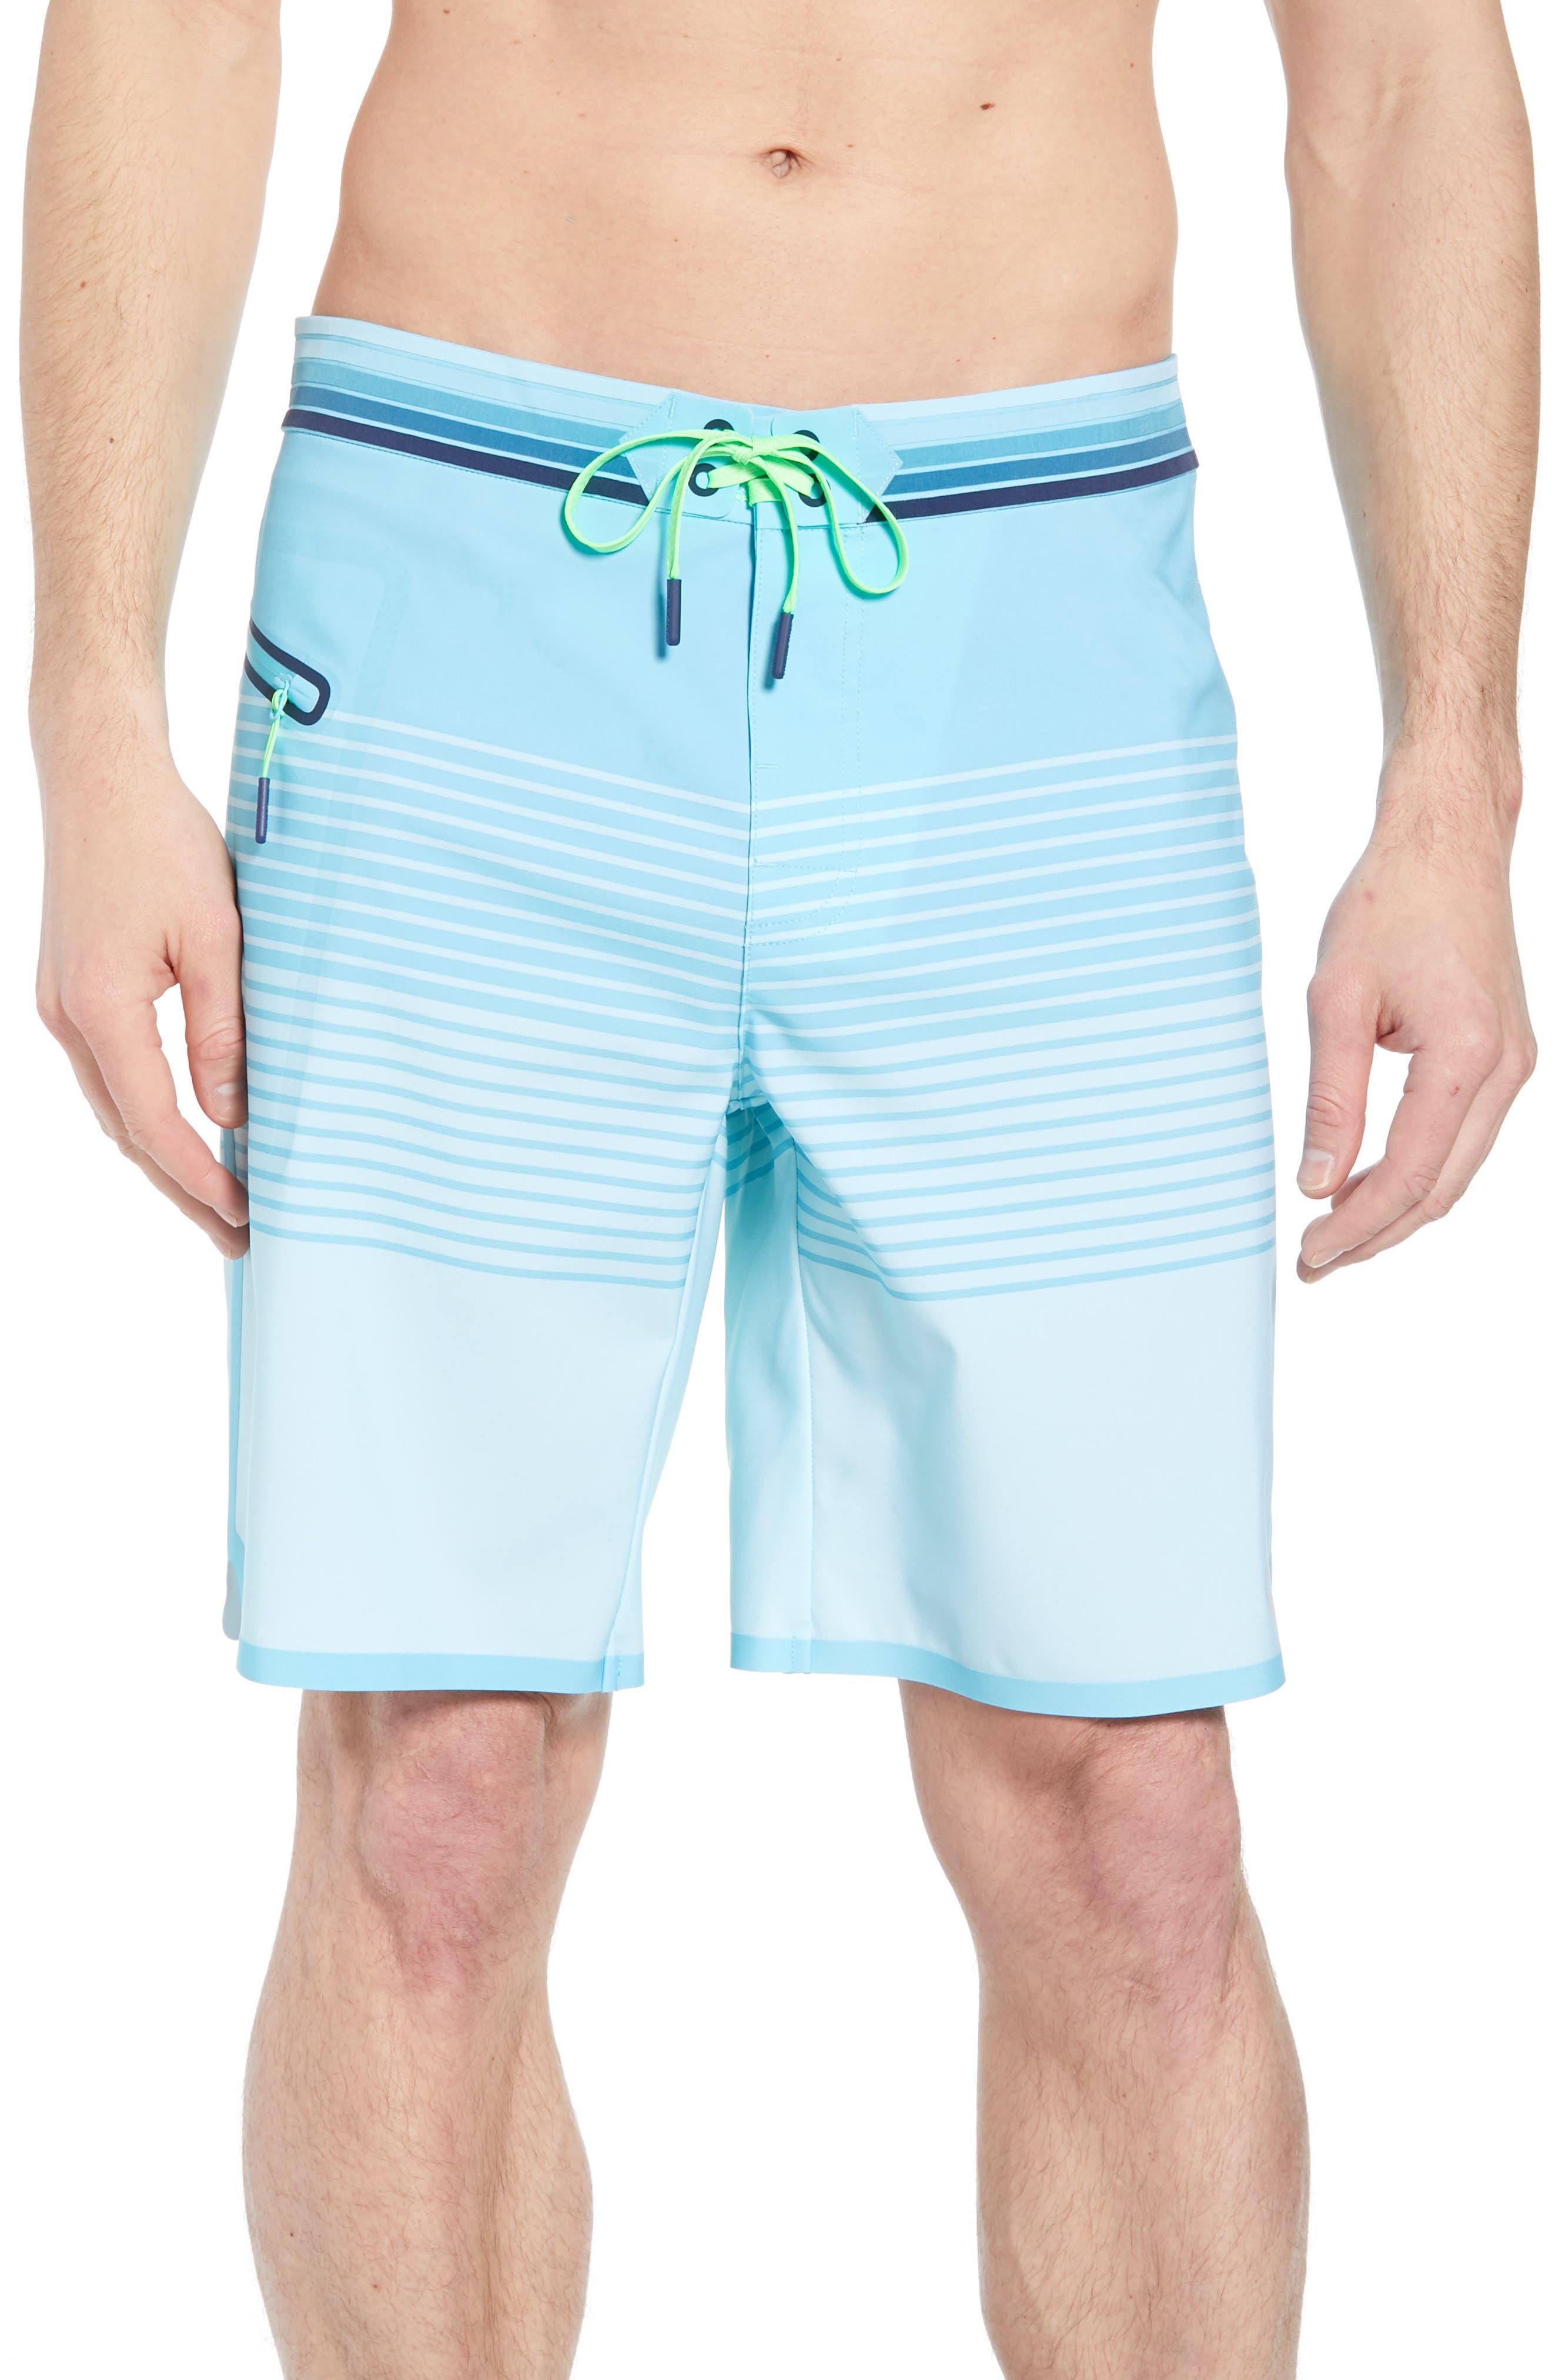 VINEYARD VINES Sculplin Stripe Tech Board Shorts, Main, color, 459